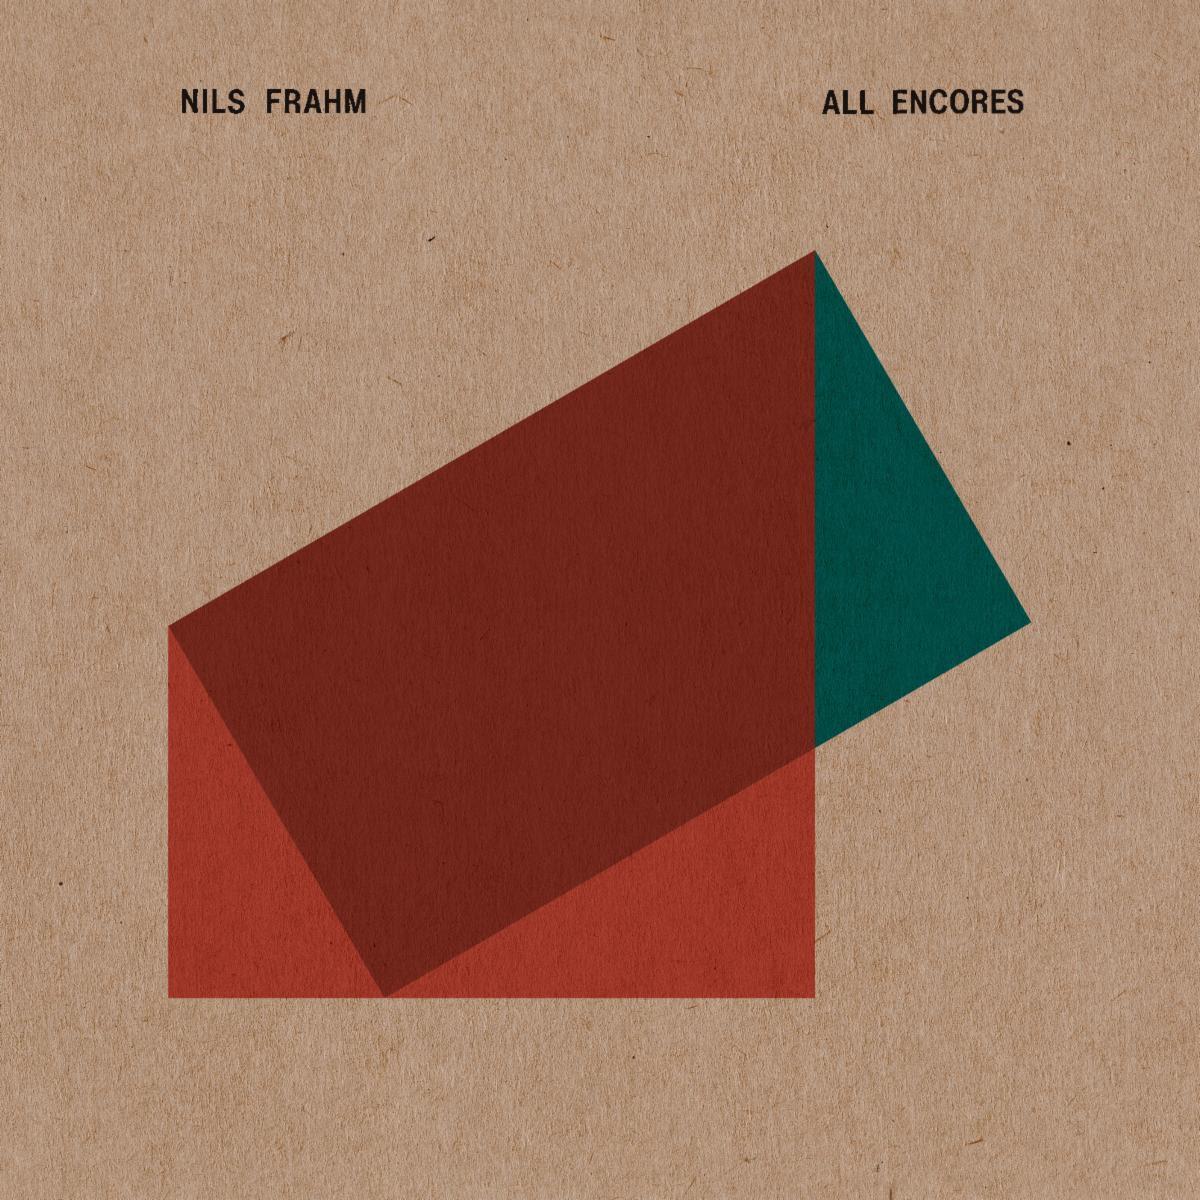 Nils Frahm All Encores cover artwork